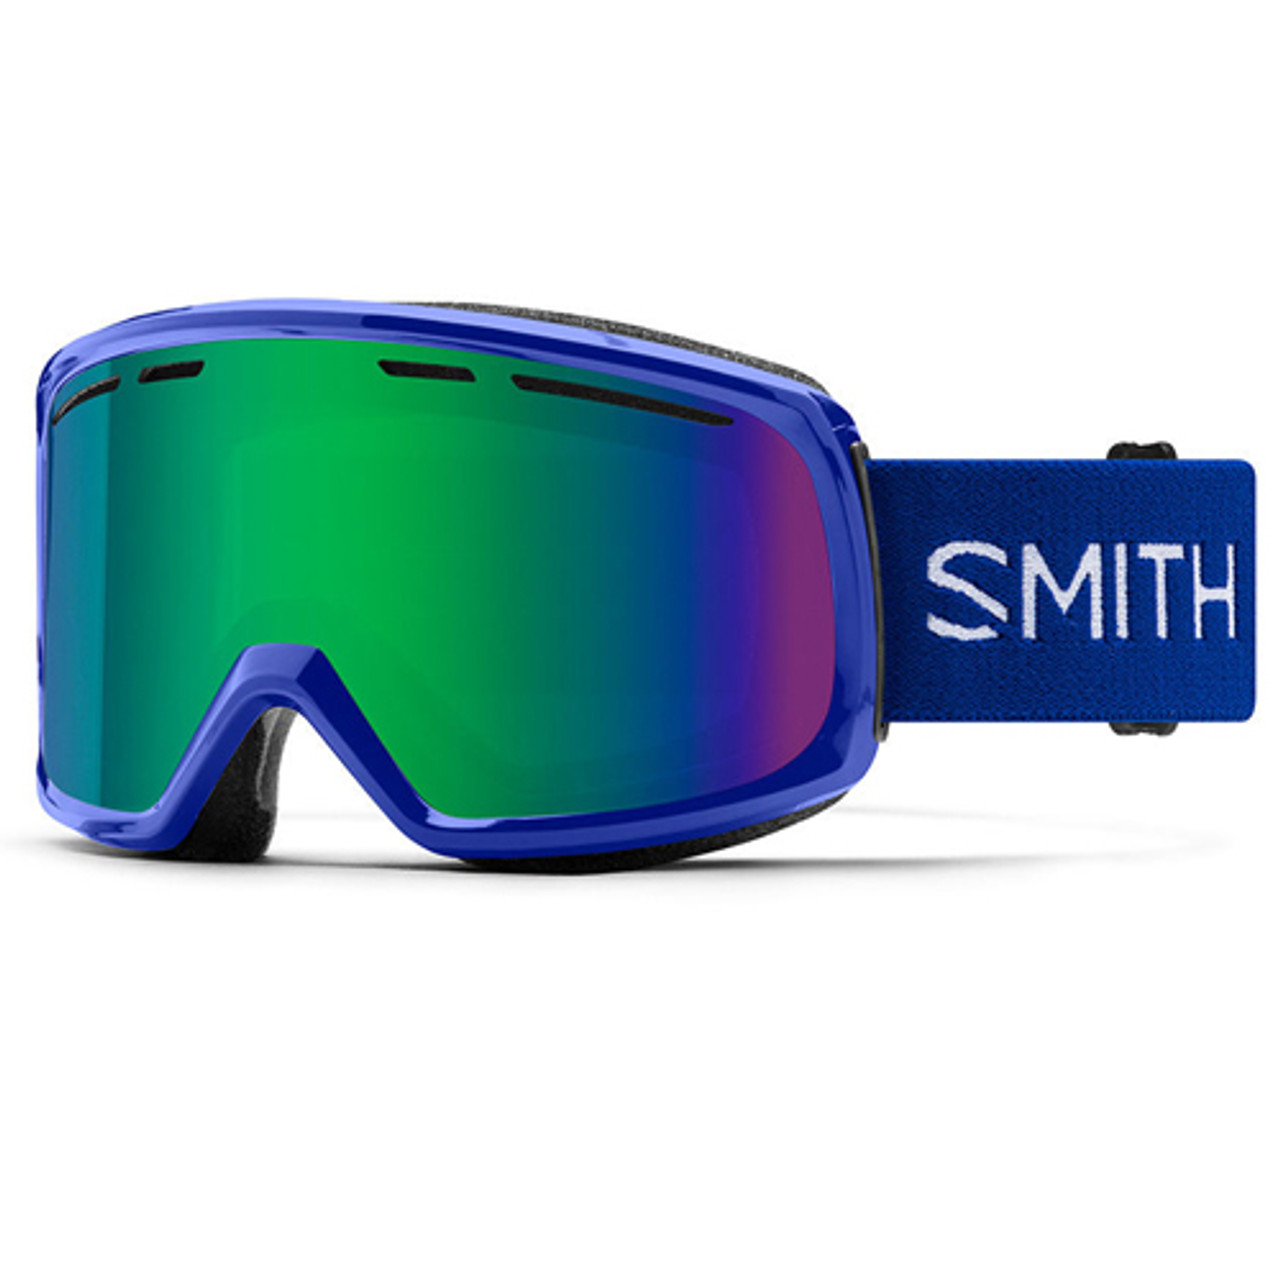 Lens for the Smith Range Ski Goggles